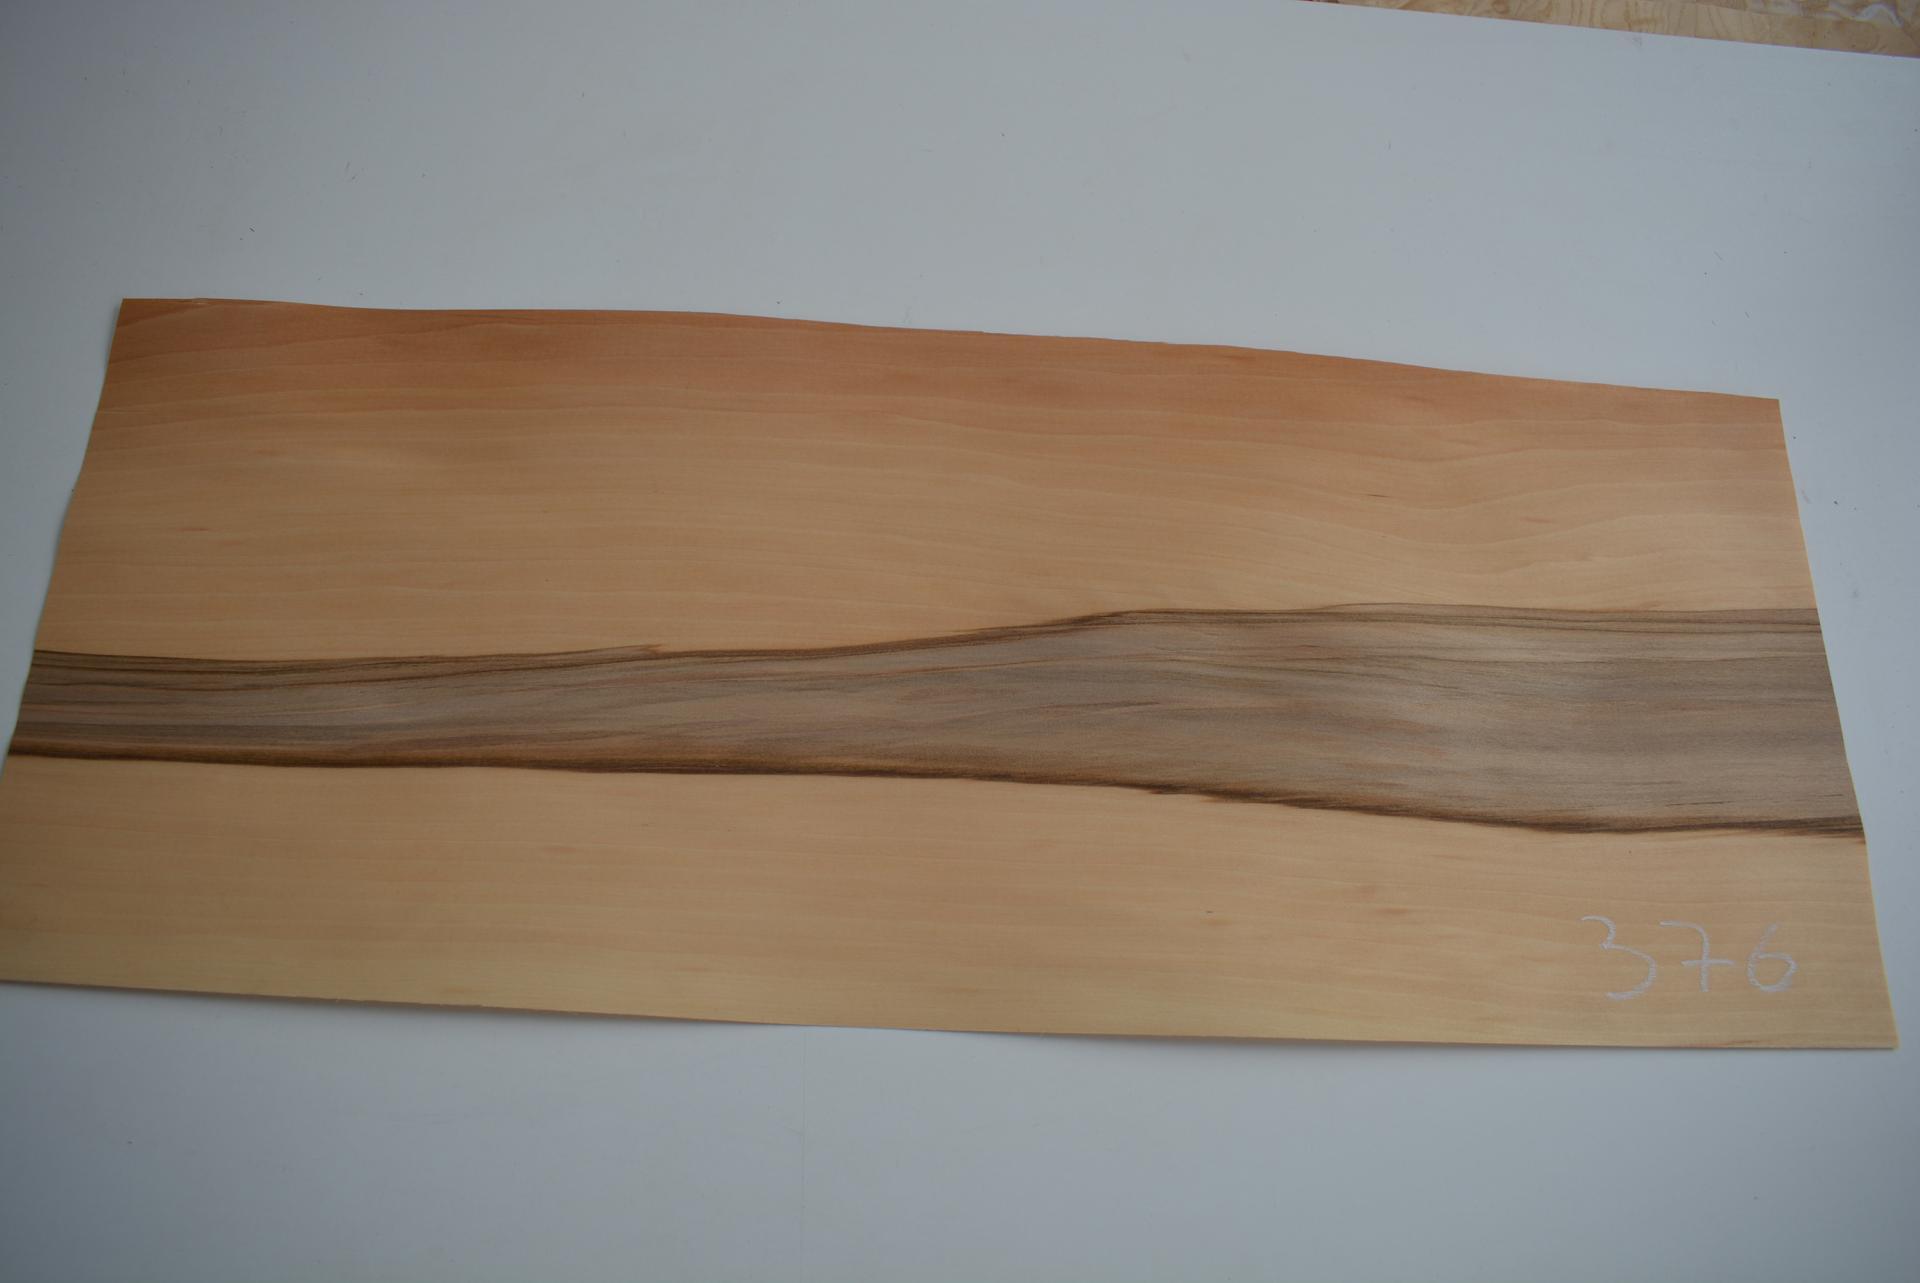 376 placage marqueterie satine 1